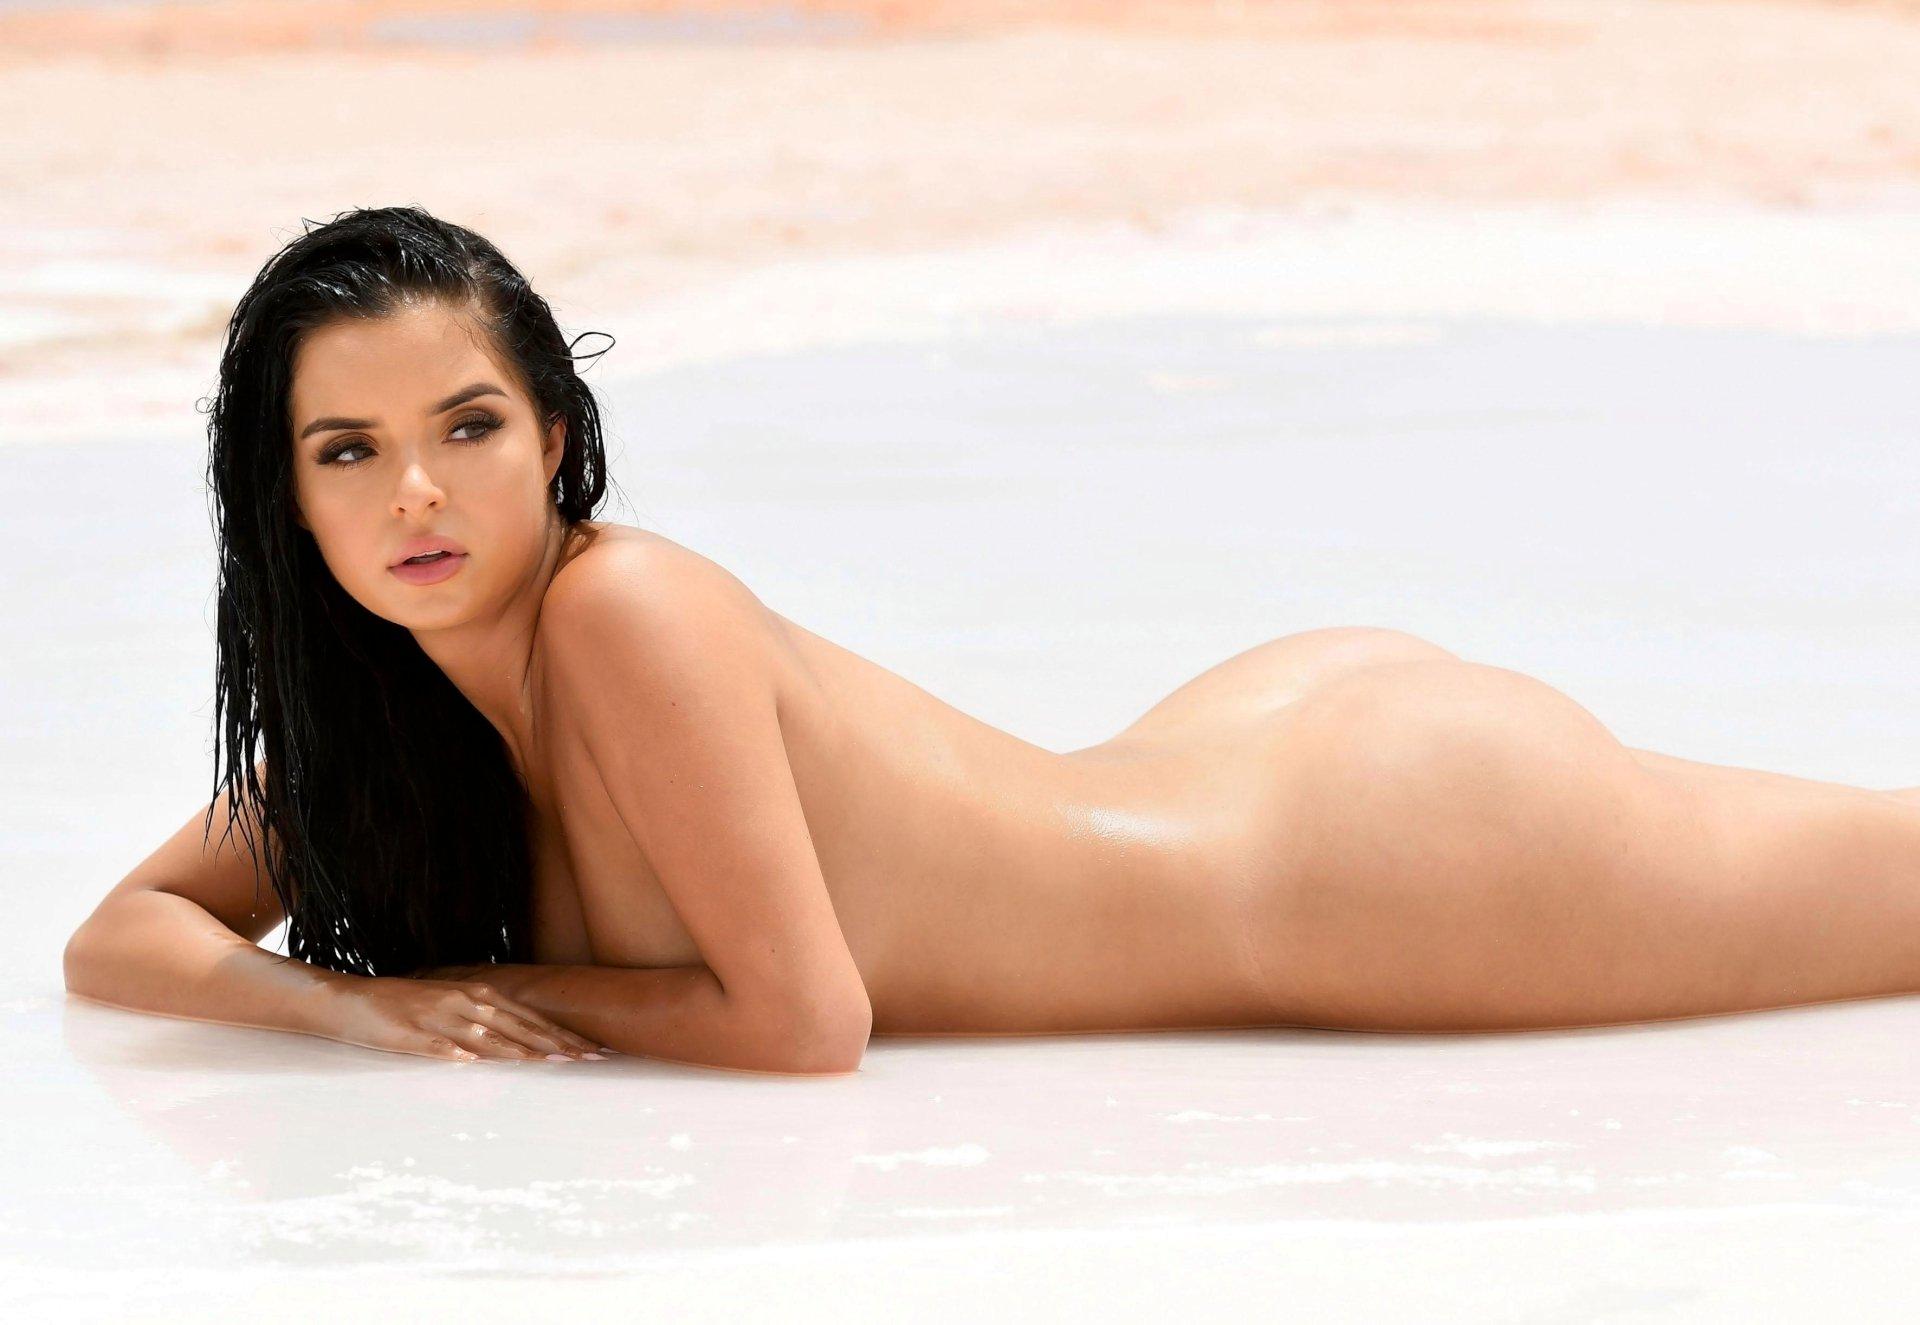 Girls sexy garnian naked